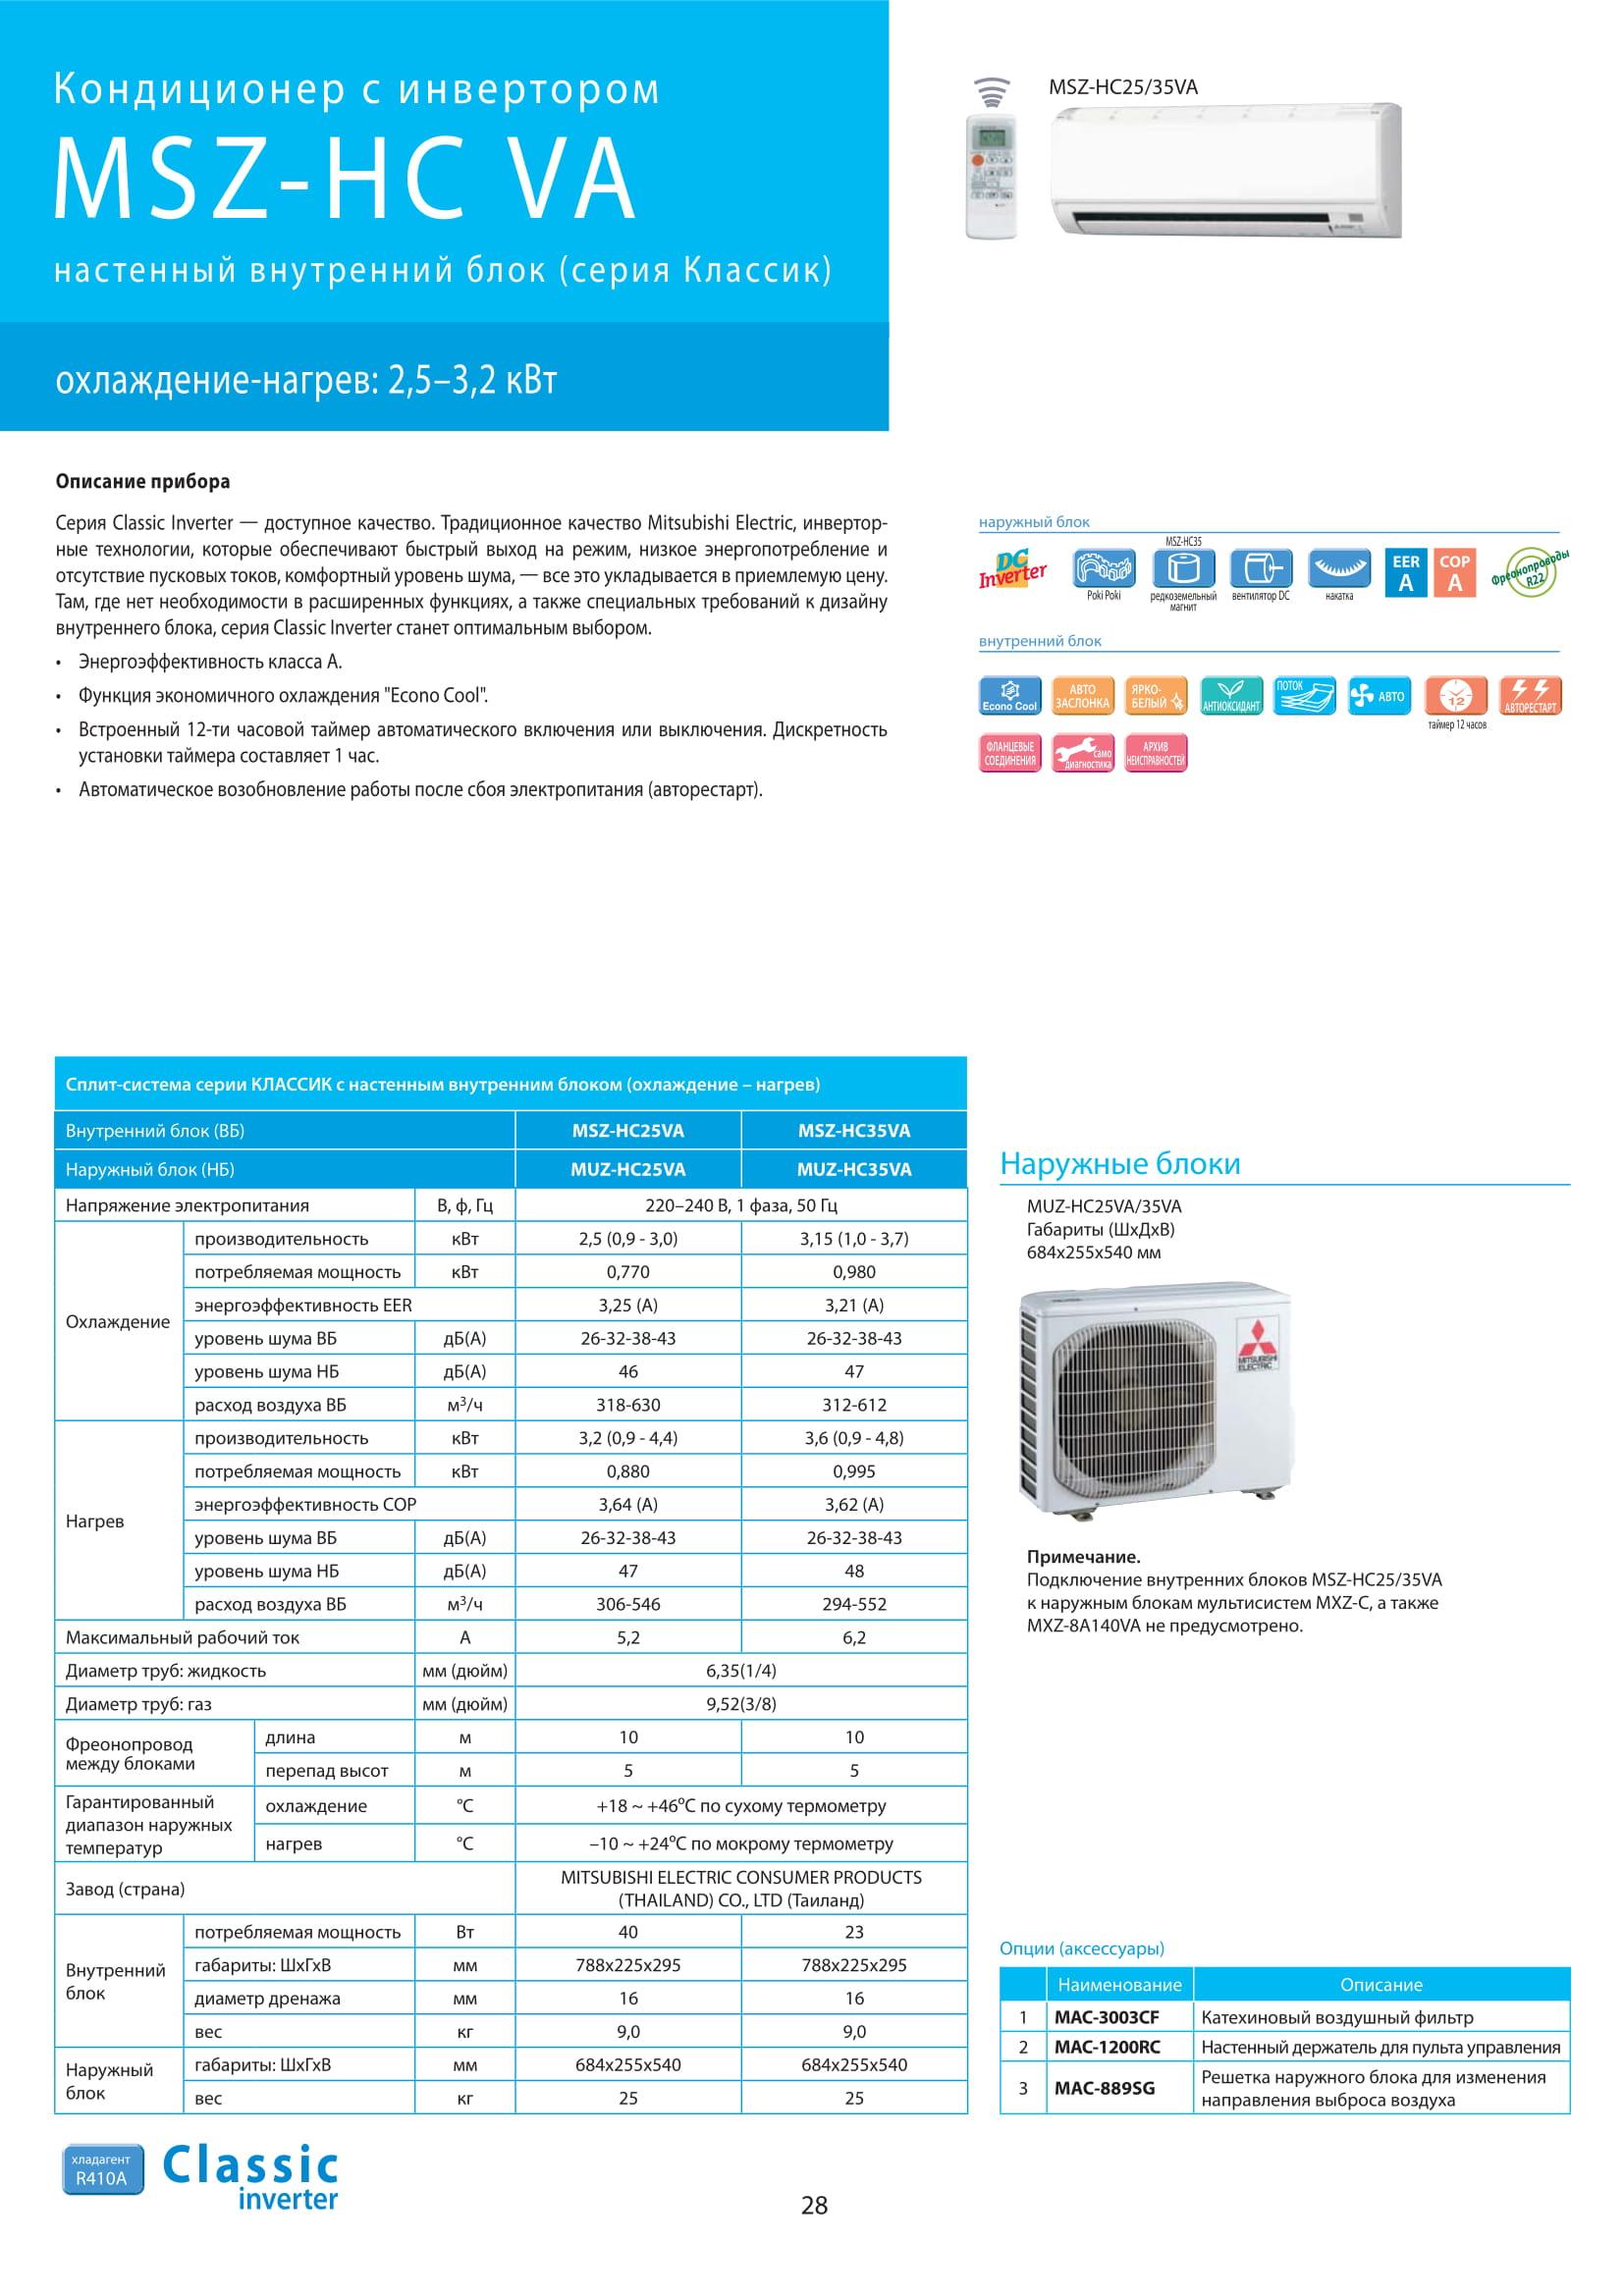 MSZ-HC_VA Mitsubishi Electric